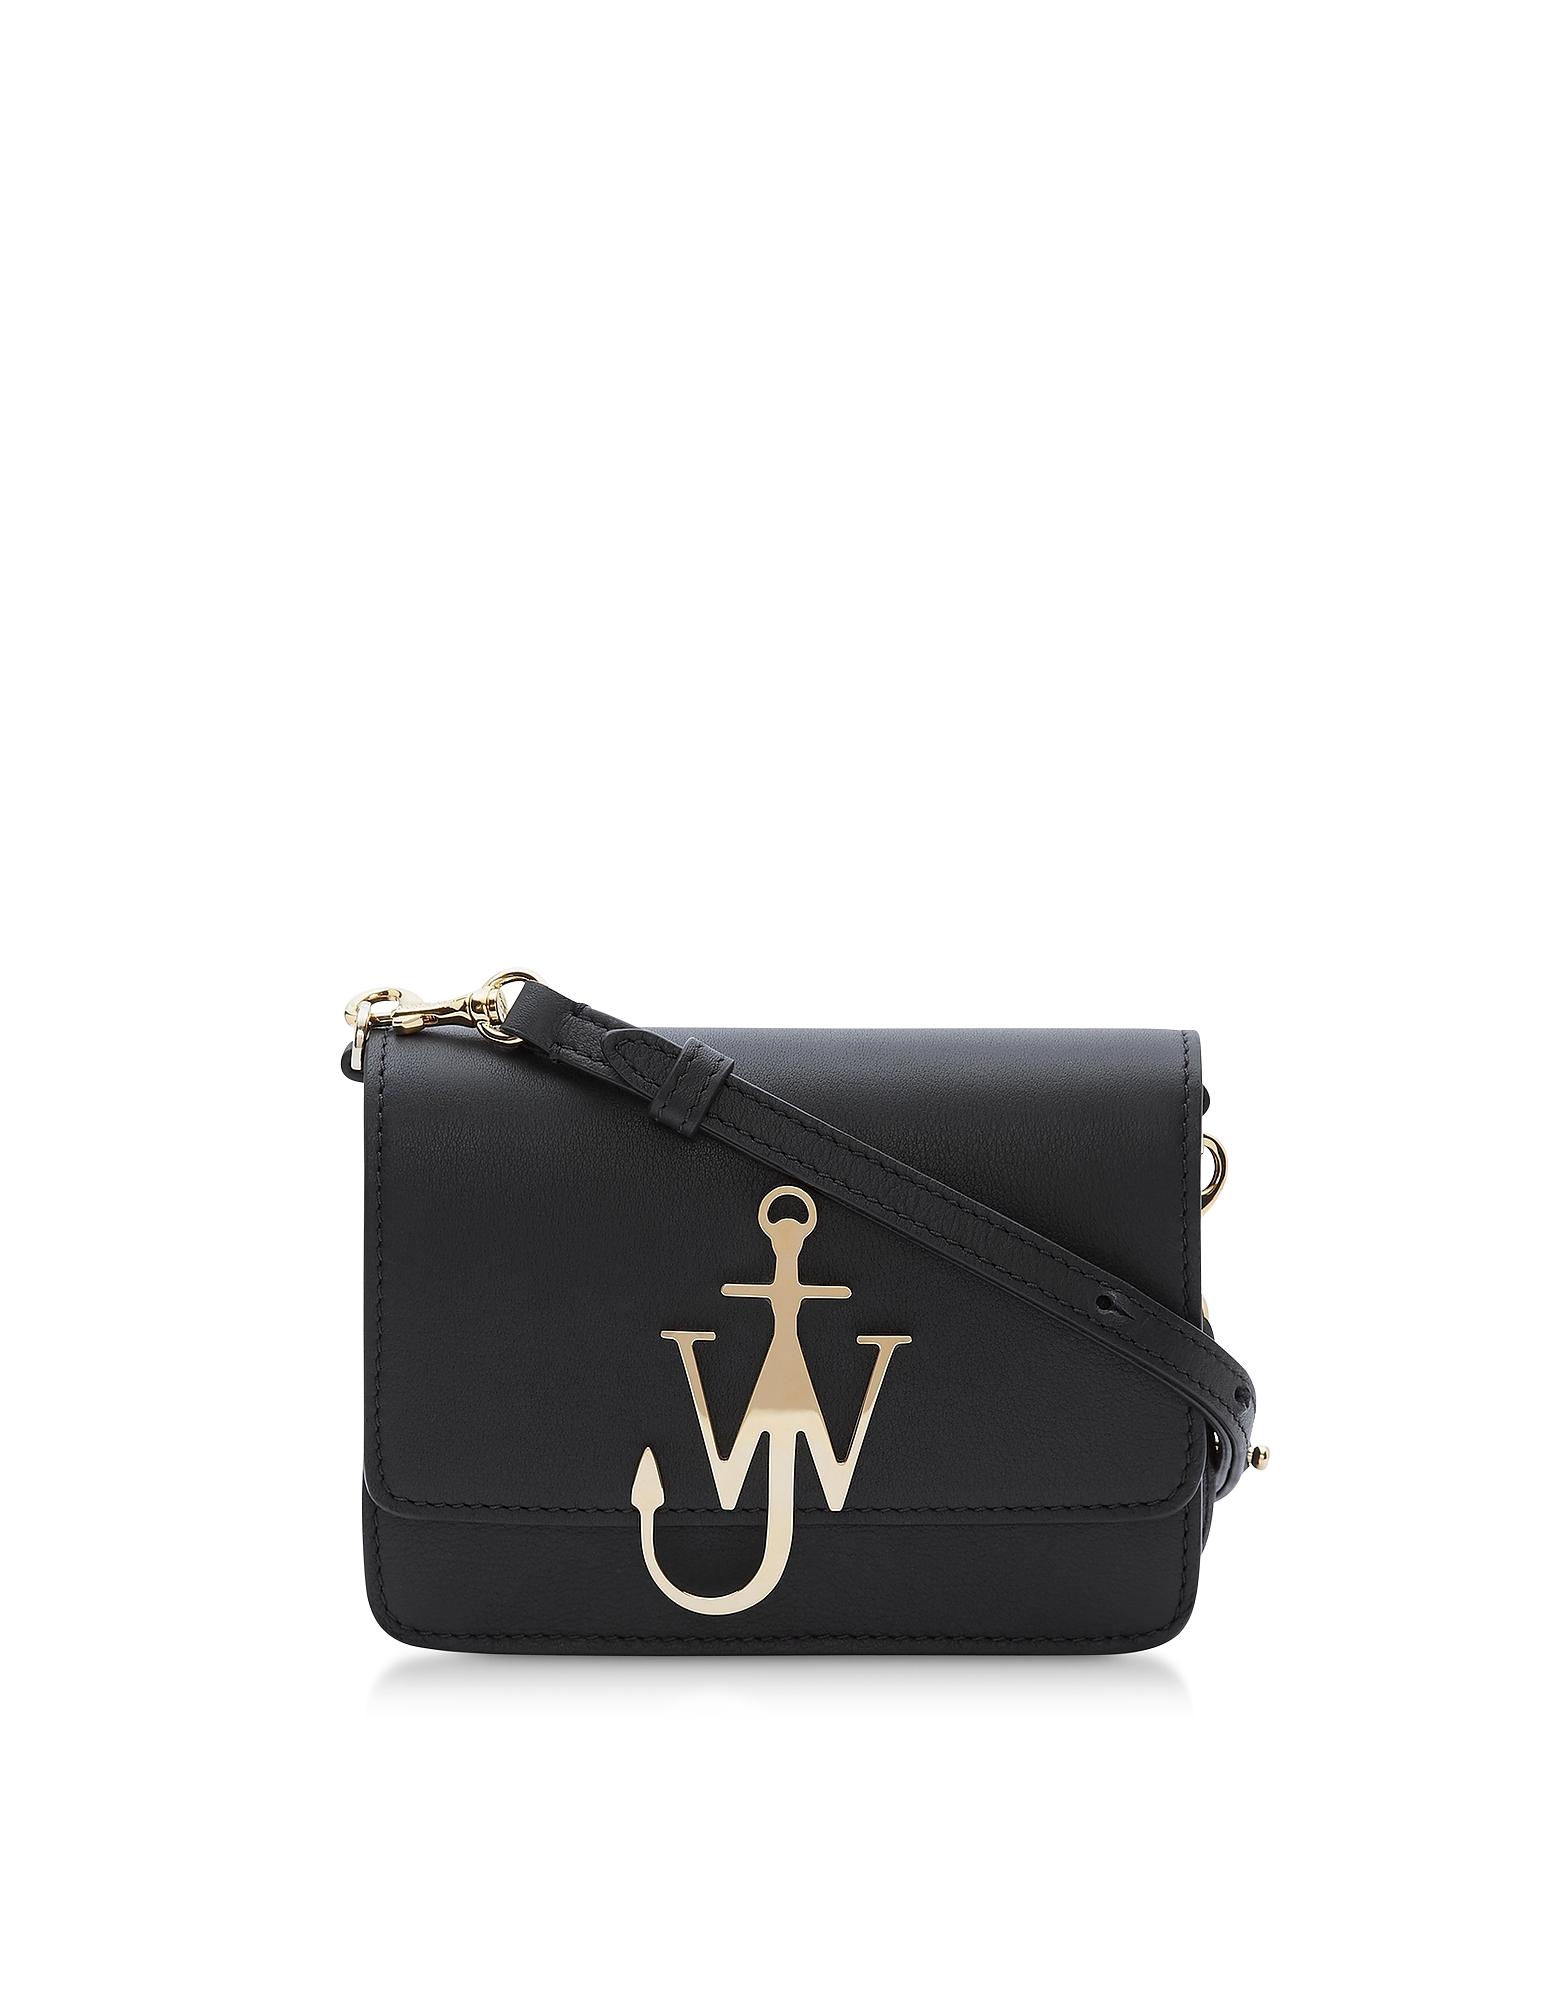 JW Anderson Designer Handbags, New Mini Logo Purse w/Shoulder Strap (Luggage & Bags) photo